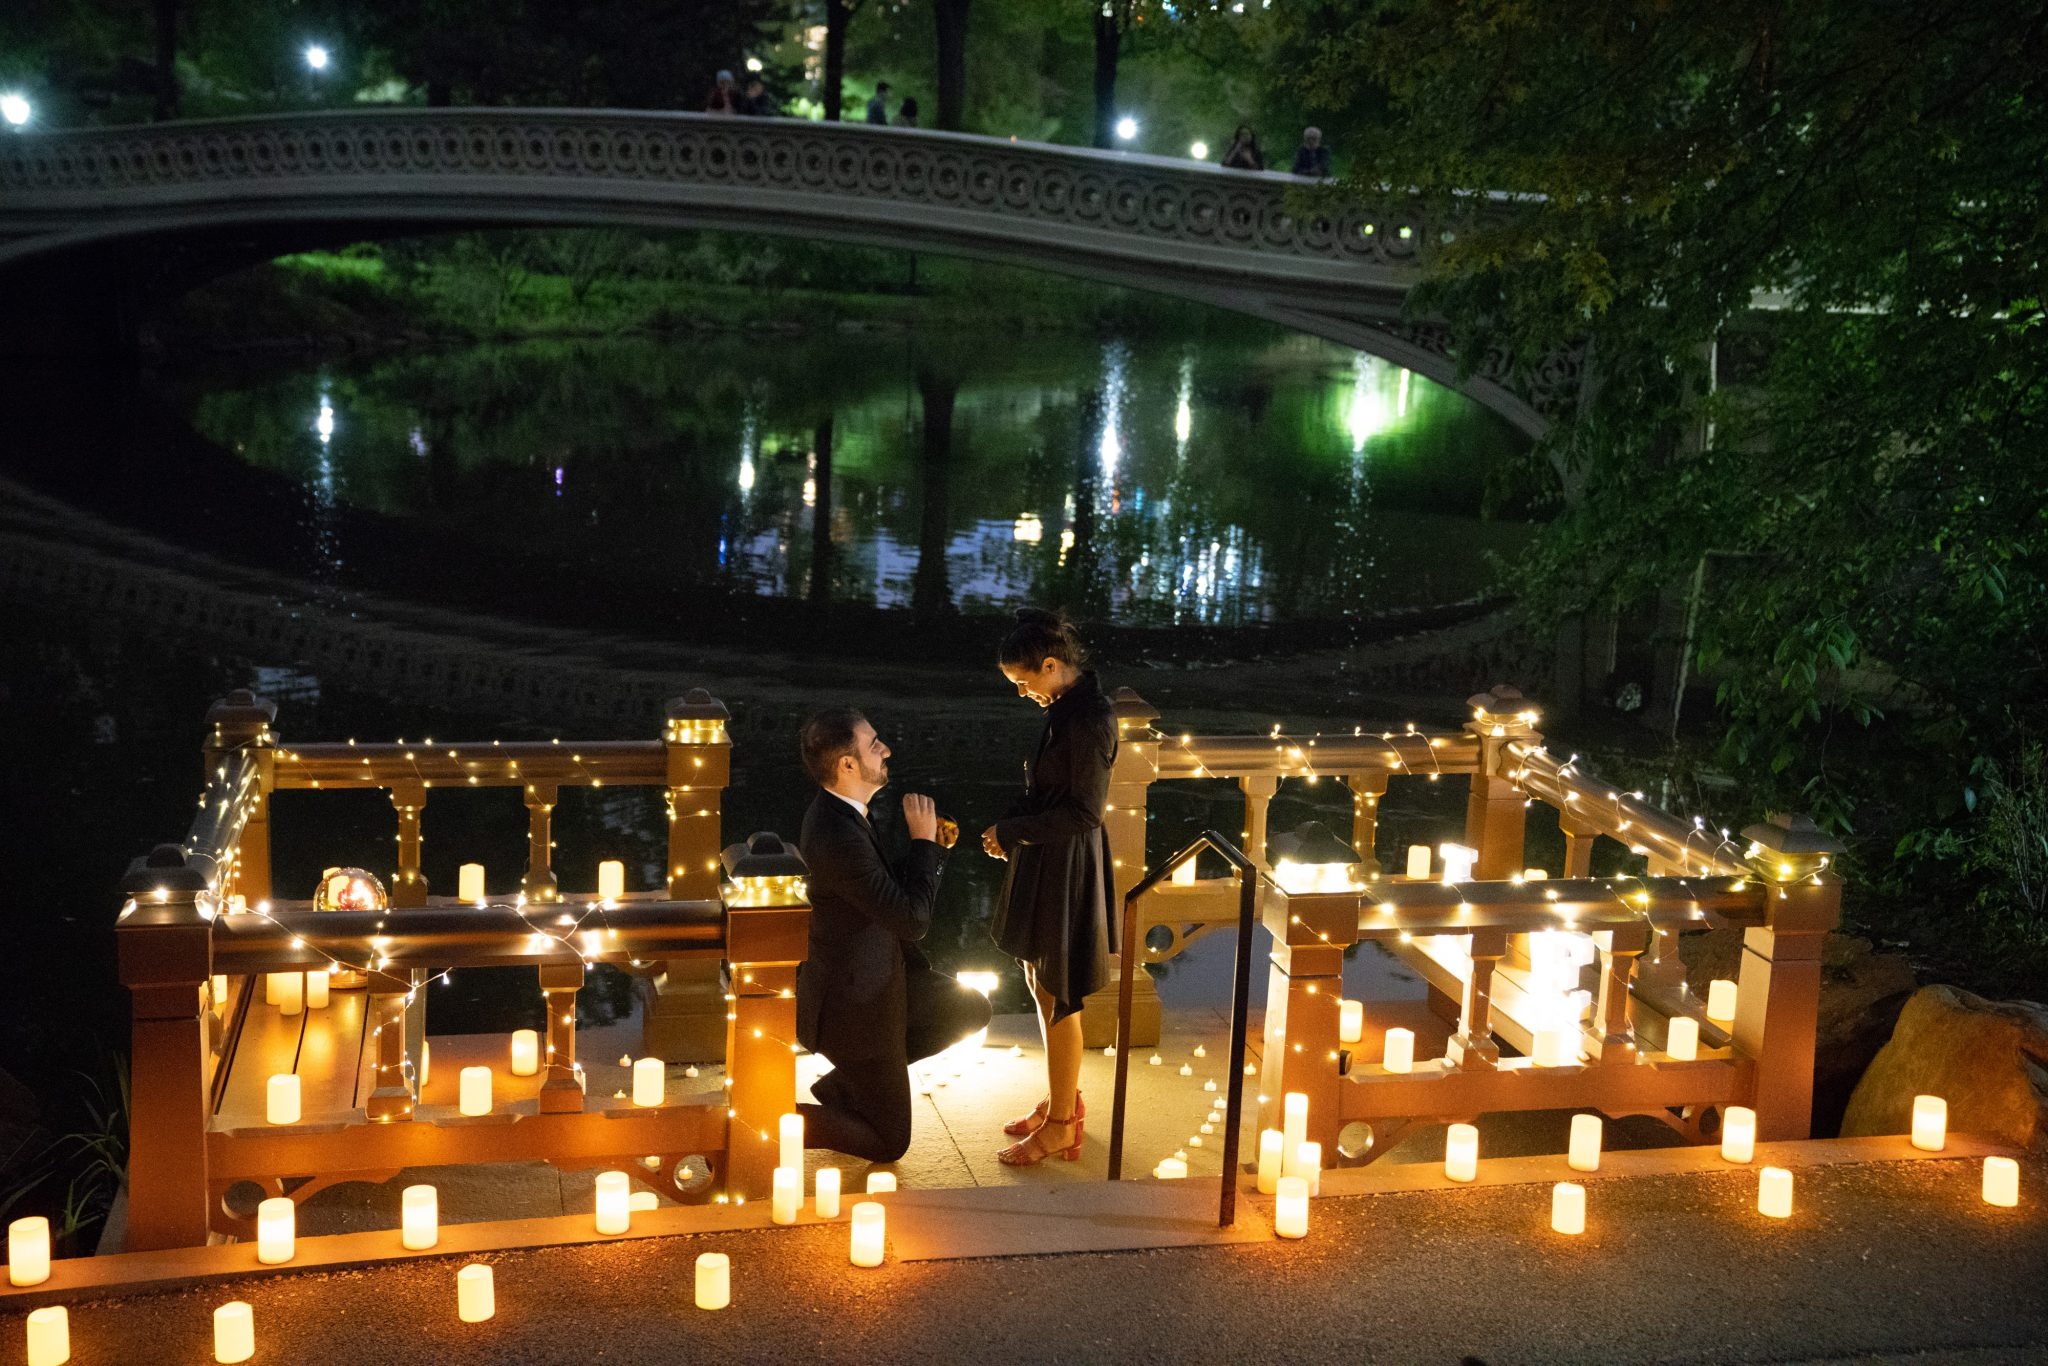 Wedding Proposal Ideas.Enchanted Rose Marriage Proposal Proposal Ideas And Planning